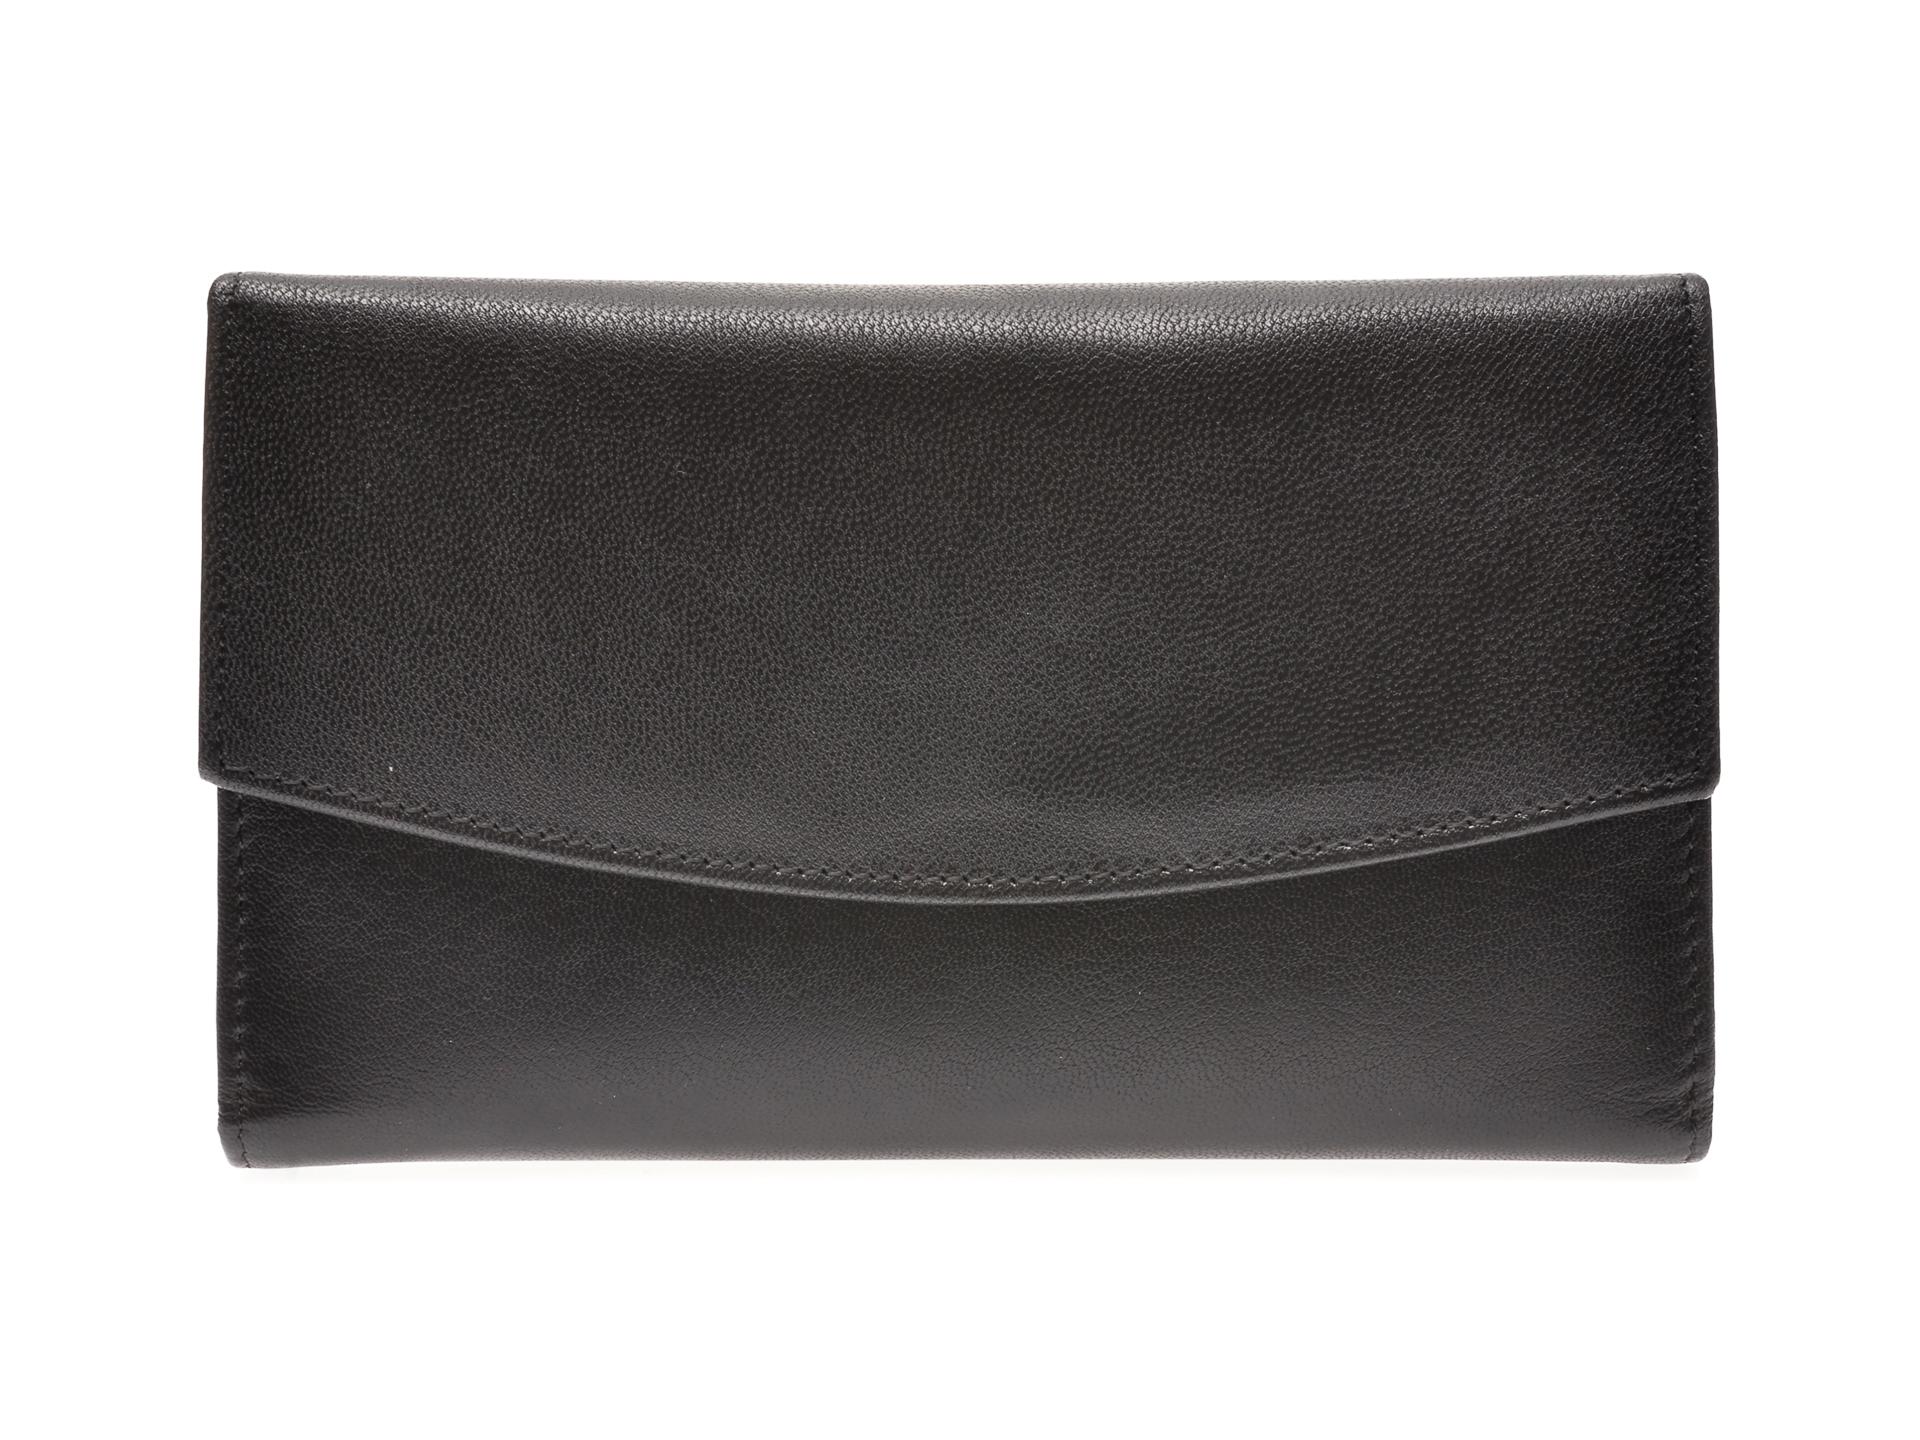 Portofel MARIO FERRETTI negru, 107, din piele naturala imagine